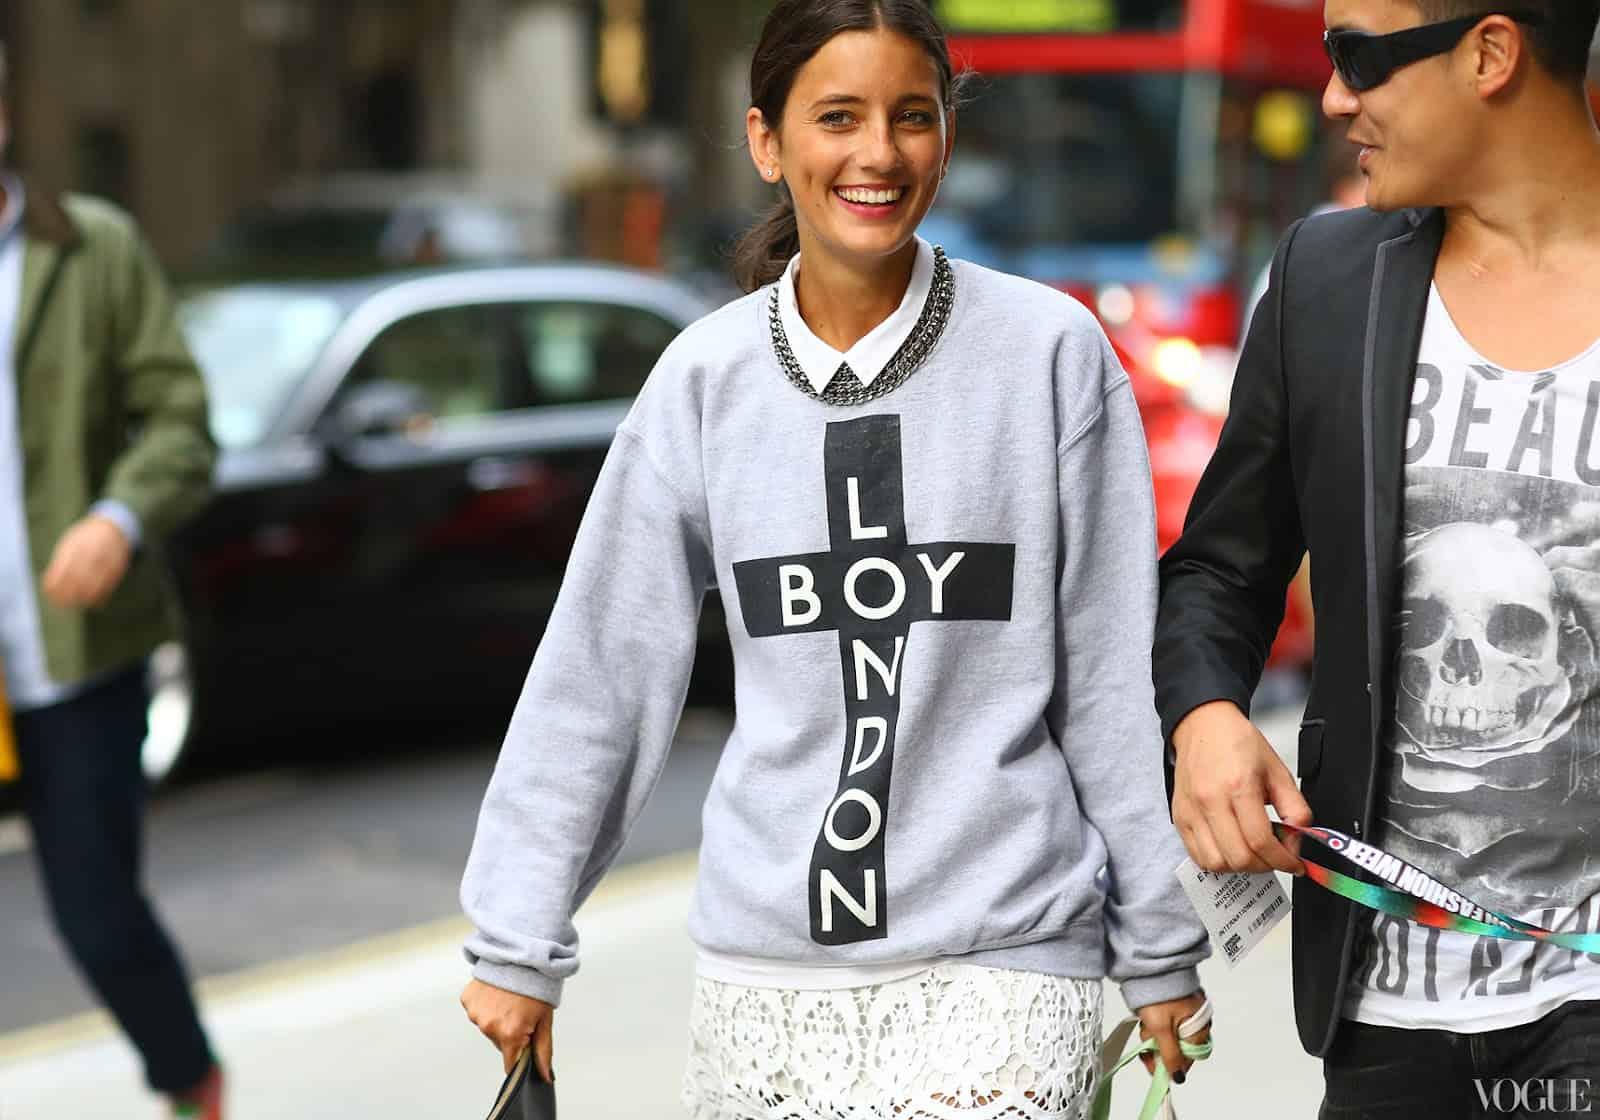 Fashionforward street style looks in